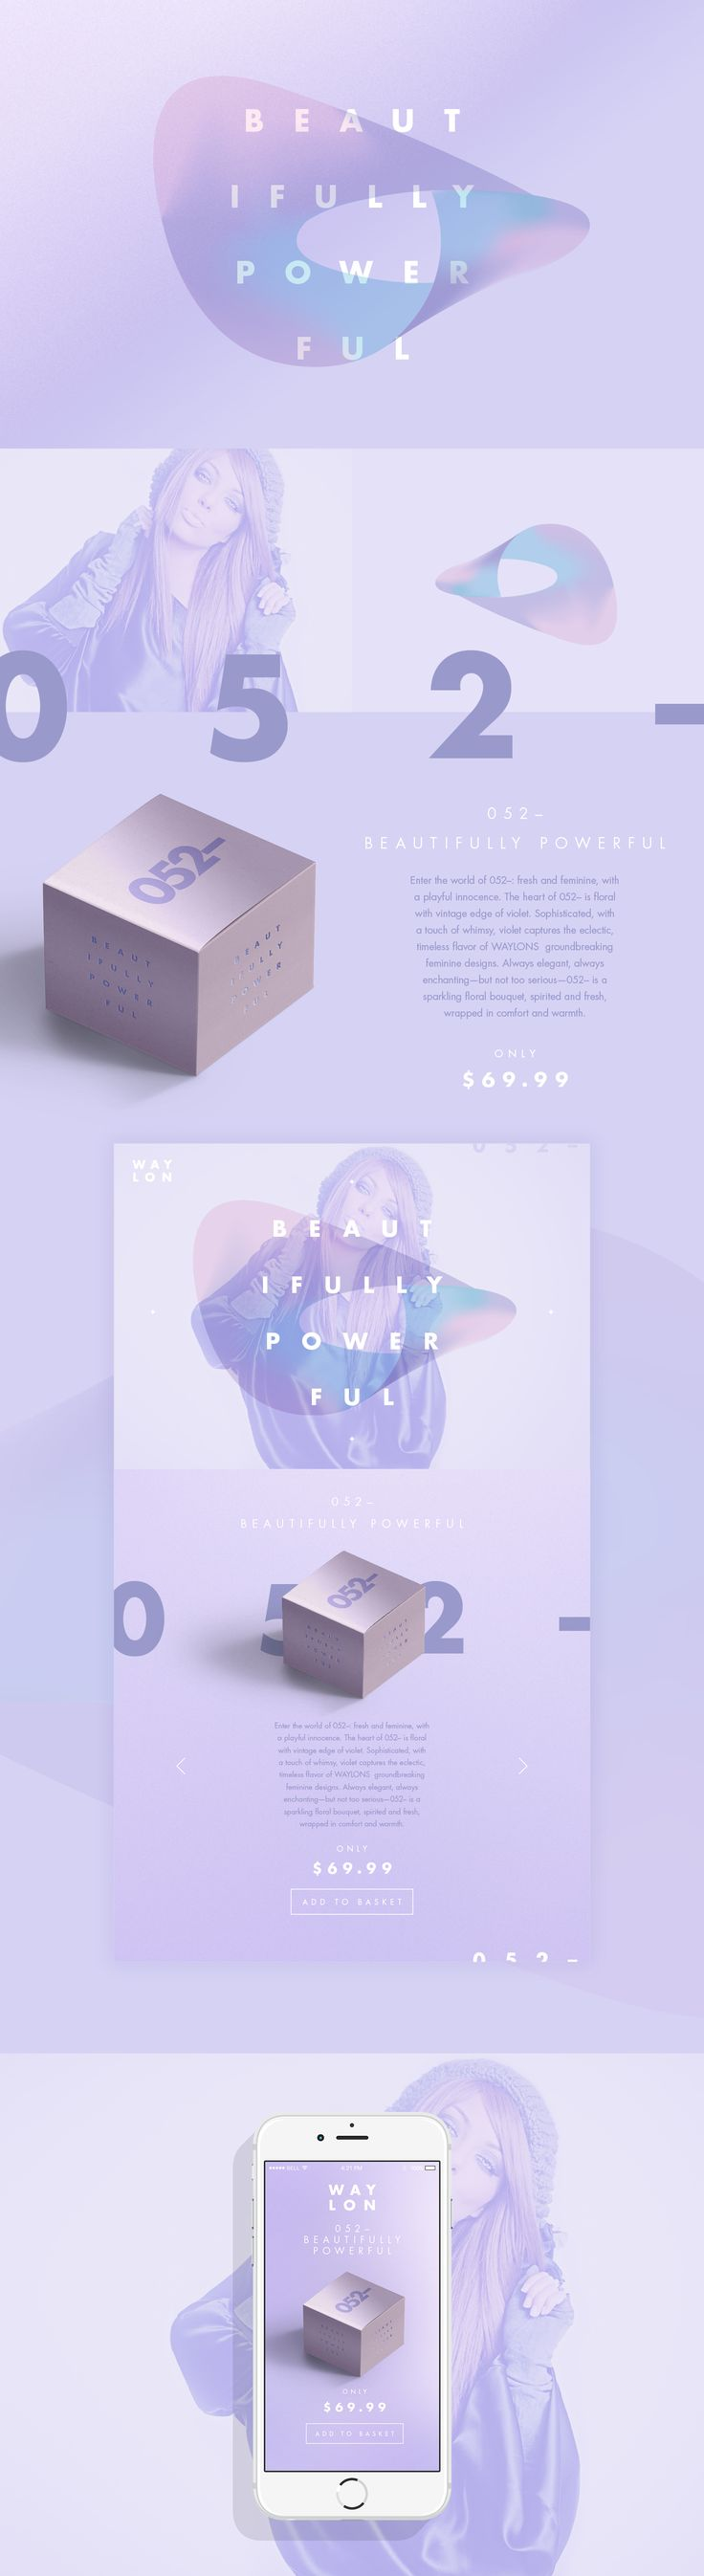 WAYLON // Beautiful Perfume Brand and Ui design concept by Jonathan Quintin on Behance.